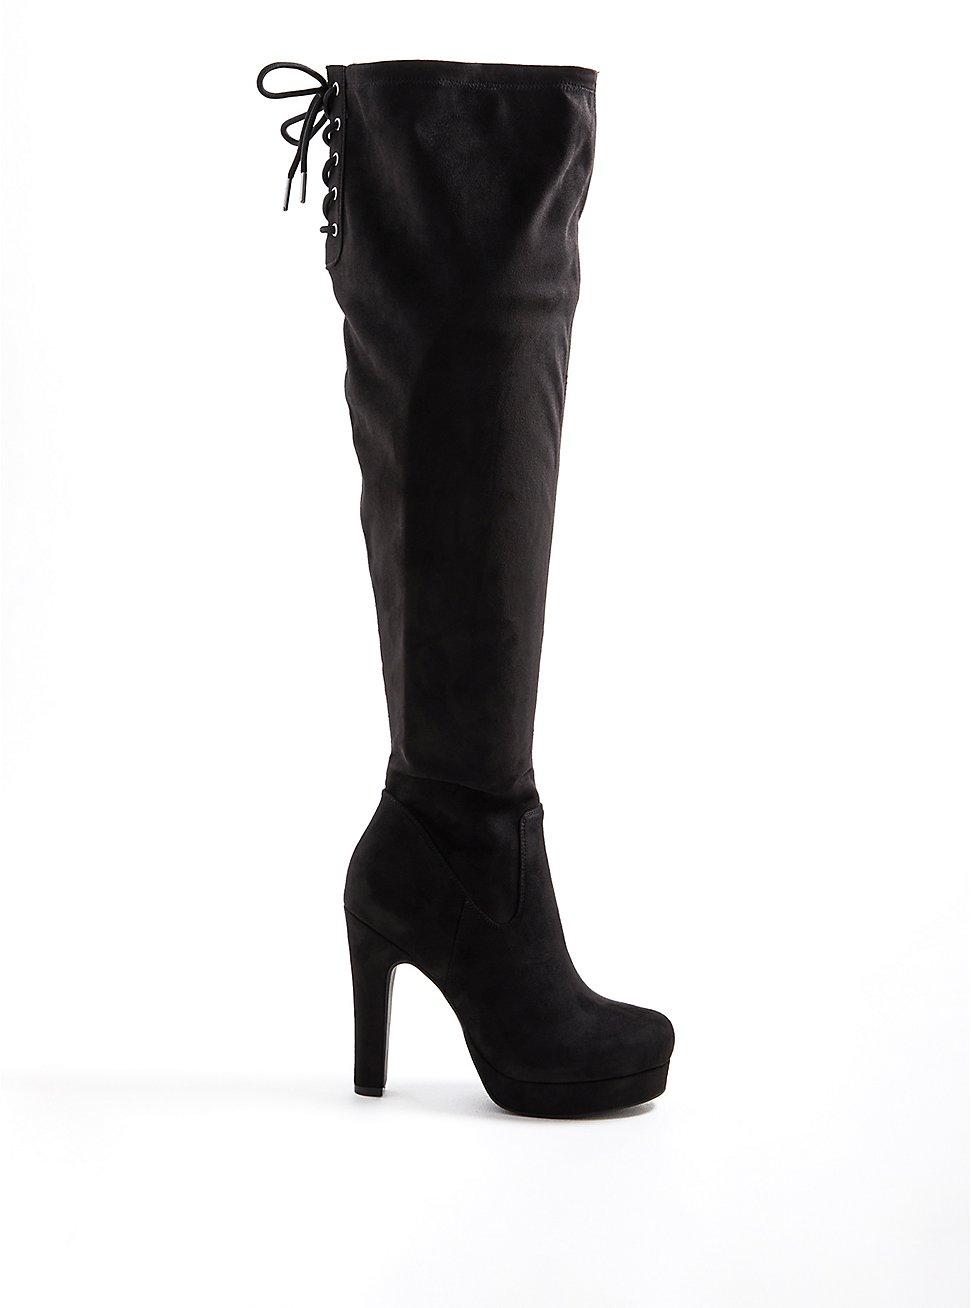 Plus Size Over-The-Knee Platform Boot - Stretch Faux Suede Black, BLACK, hi-res